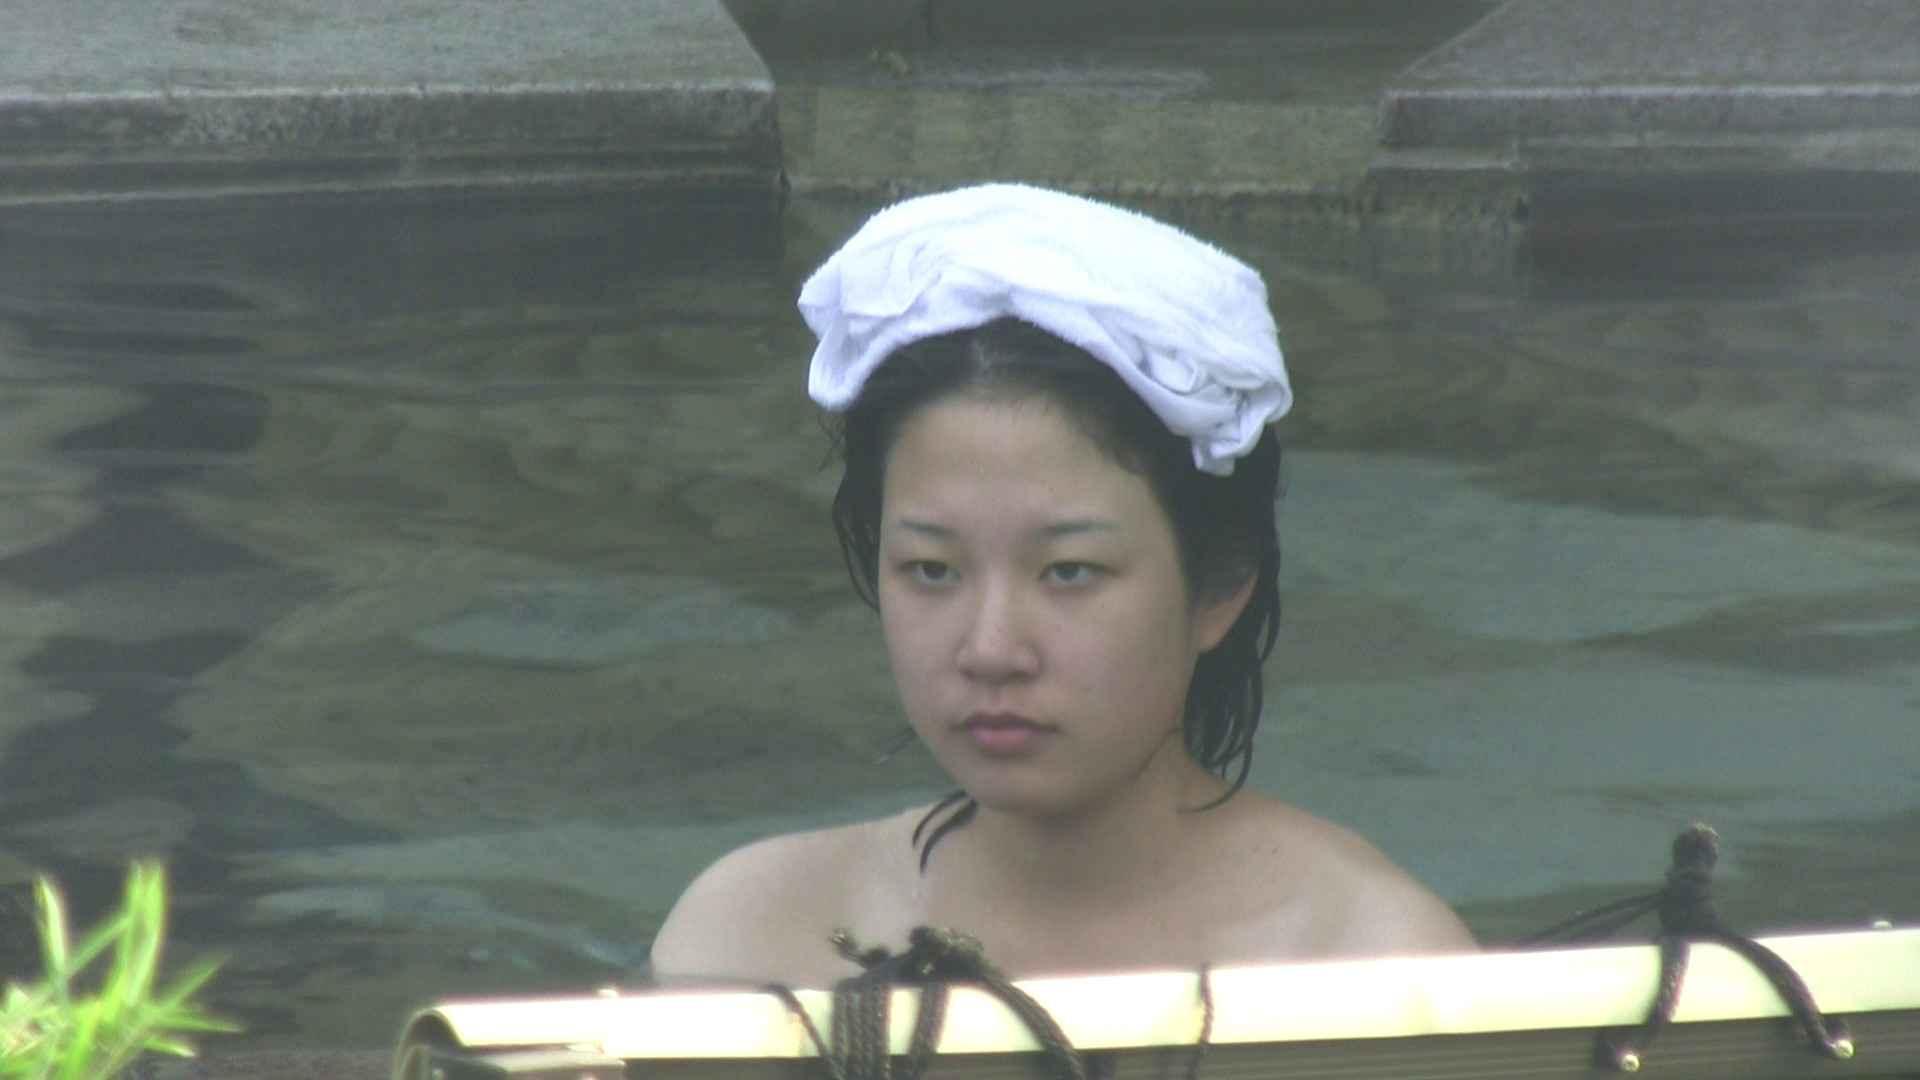 Aquaな露天風呂Vol.172 盗撮   HなOL  55pic 24